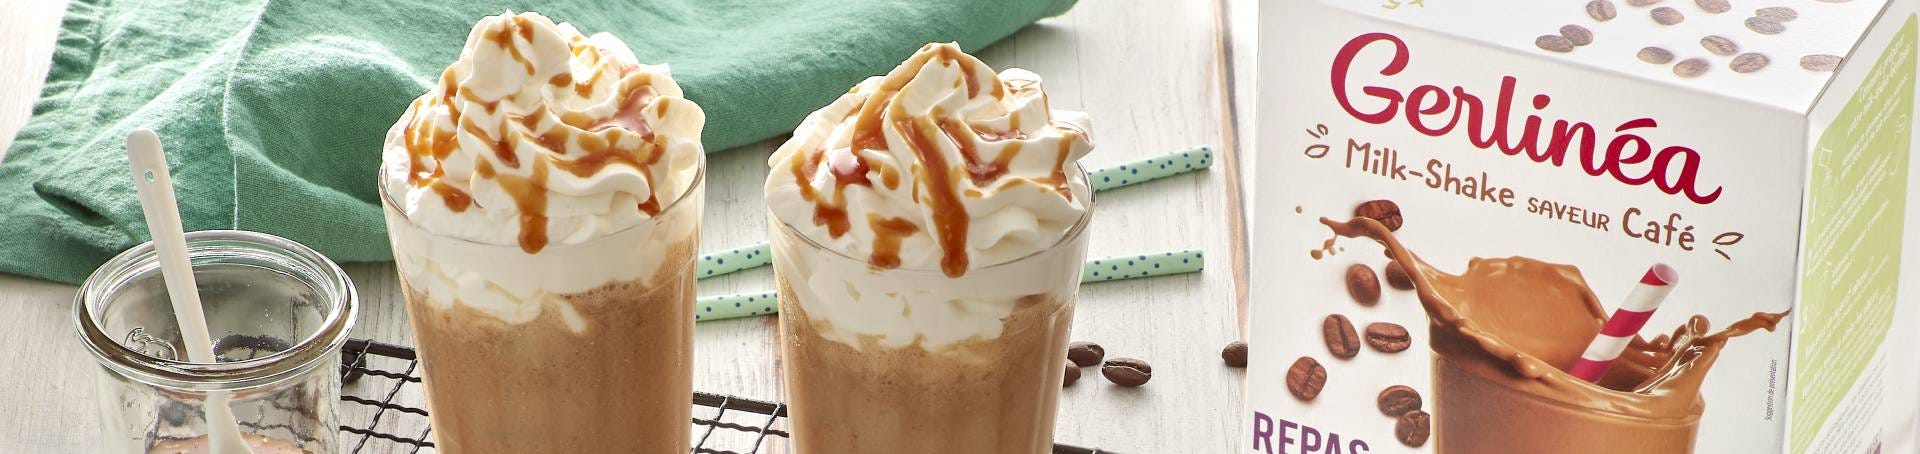 café frappé avec milk-shake café gerlinea